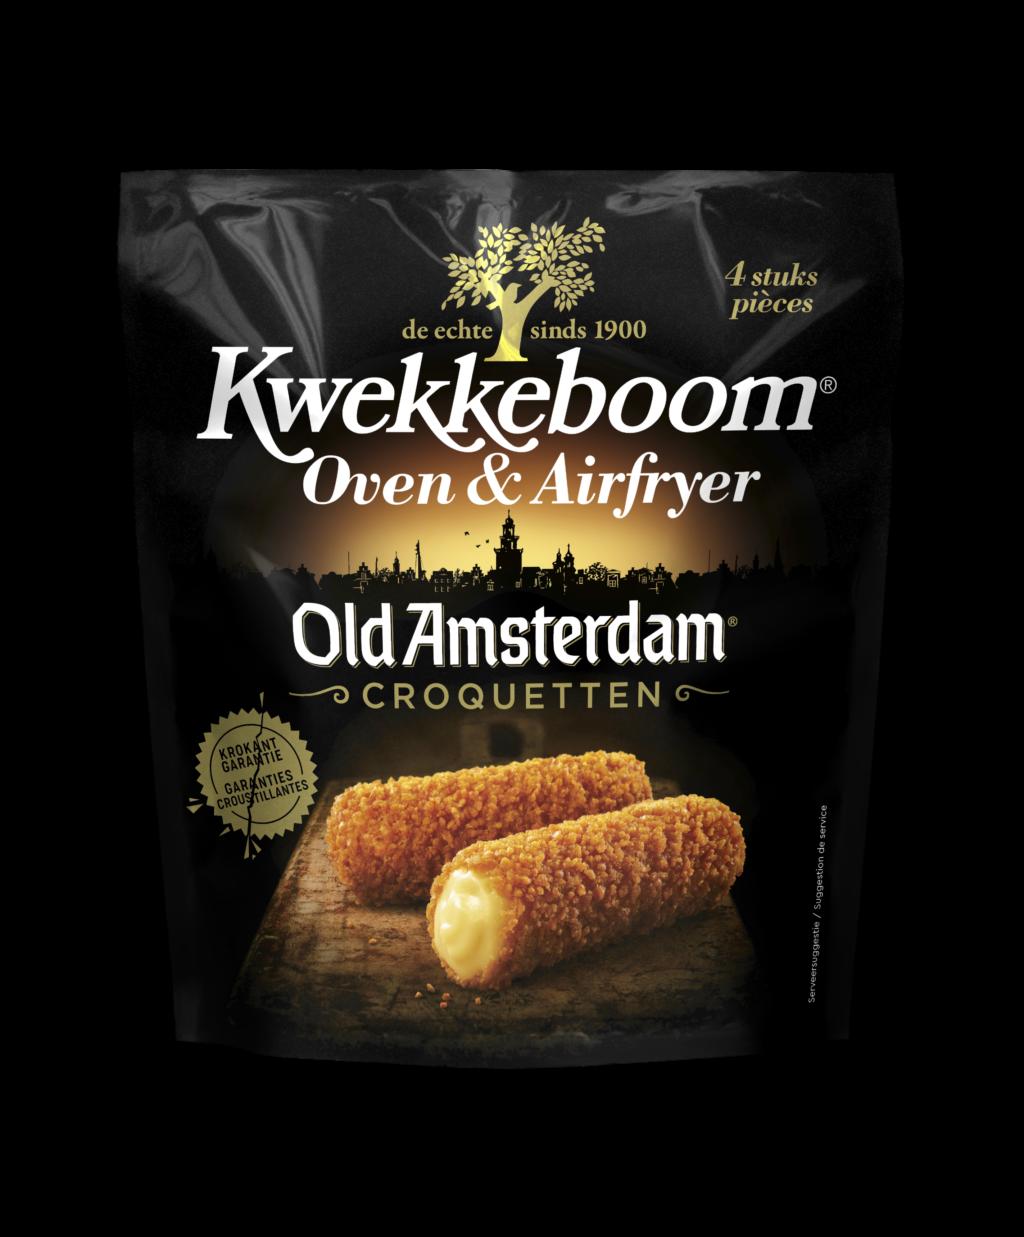 Old Amsterdam Croquetten